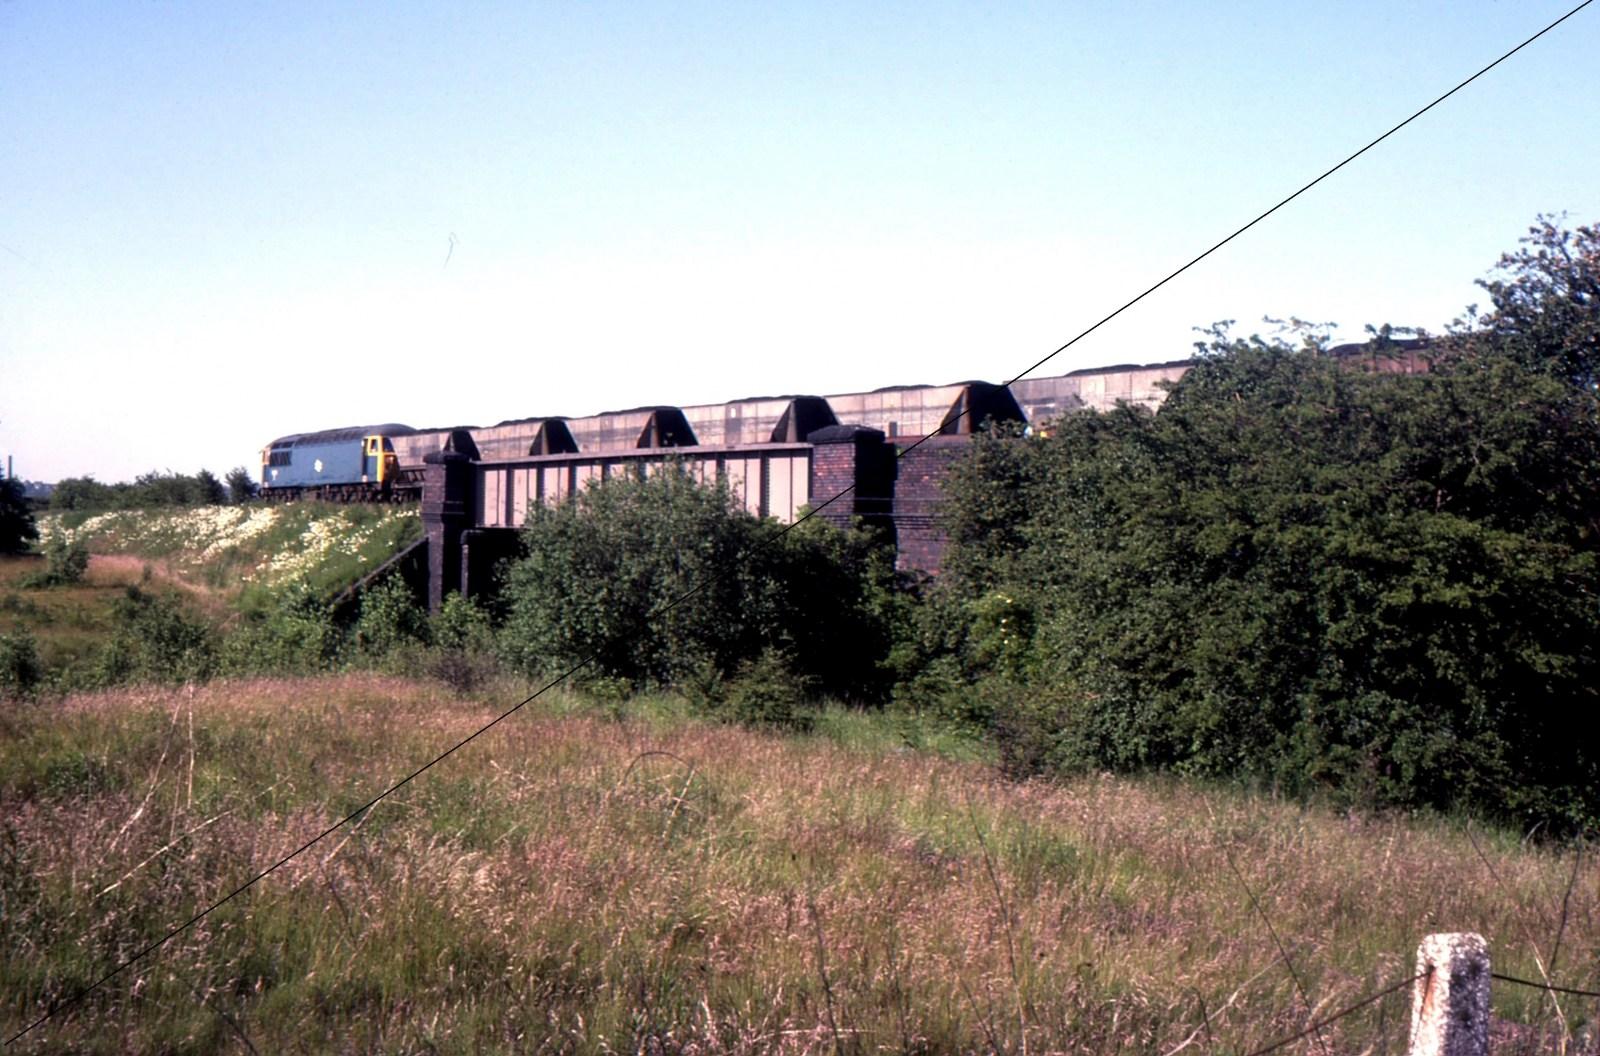 LDE029-ECR-1977, Class 56, No.56024 at Killamarsh Junction, LD&ECR bridge over Waleswood Curve, on ex-Westhorpe Colliery Mineral Train-14-07-1977.jpg